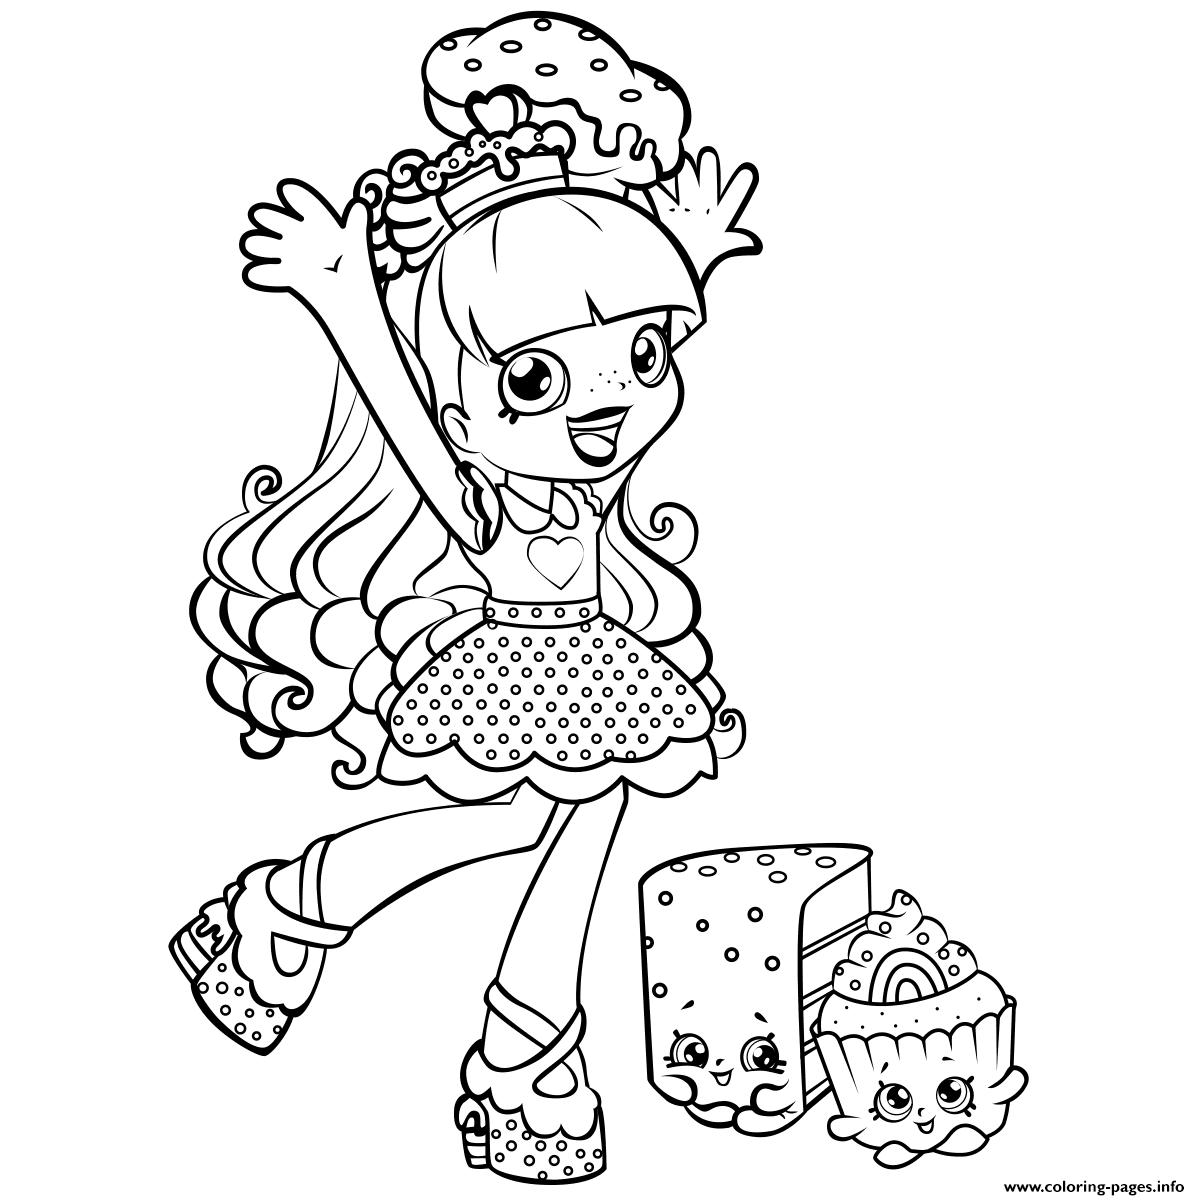 Print Shopkins Shoppie Is Happy Cupecake Coloring Pages Shopkins Colouring Pages Shopkin Coloring Pages Free Coloring Pages